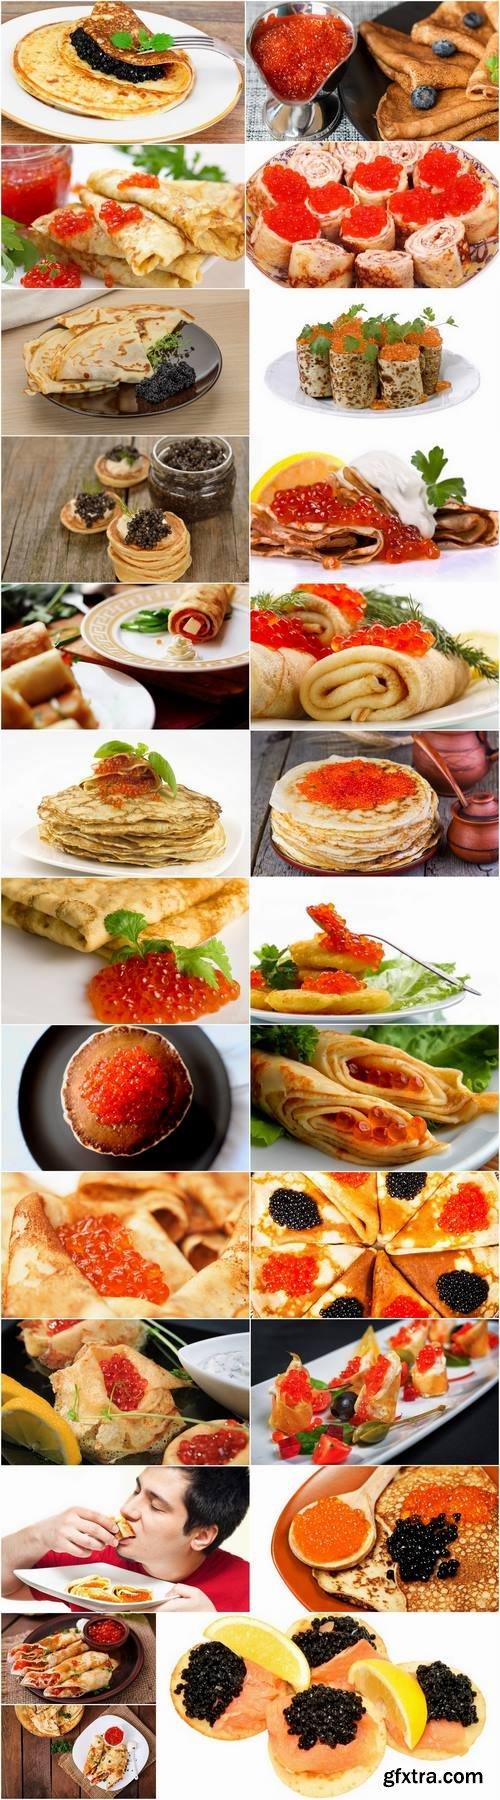 Pancake with red caviar black 25 HQ Jpeg